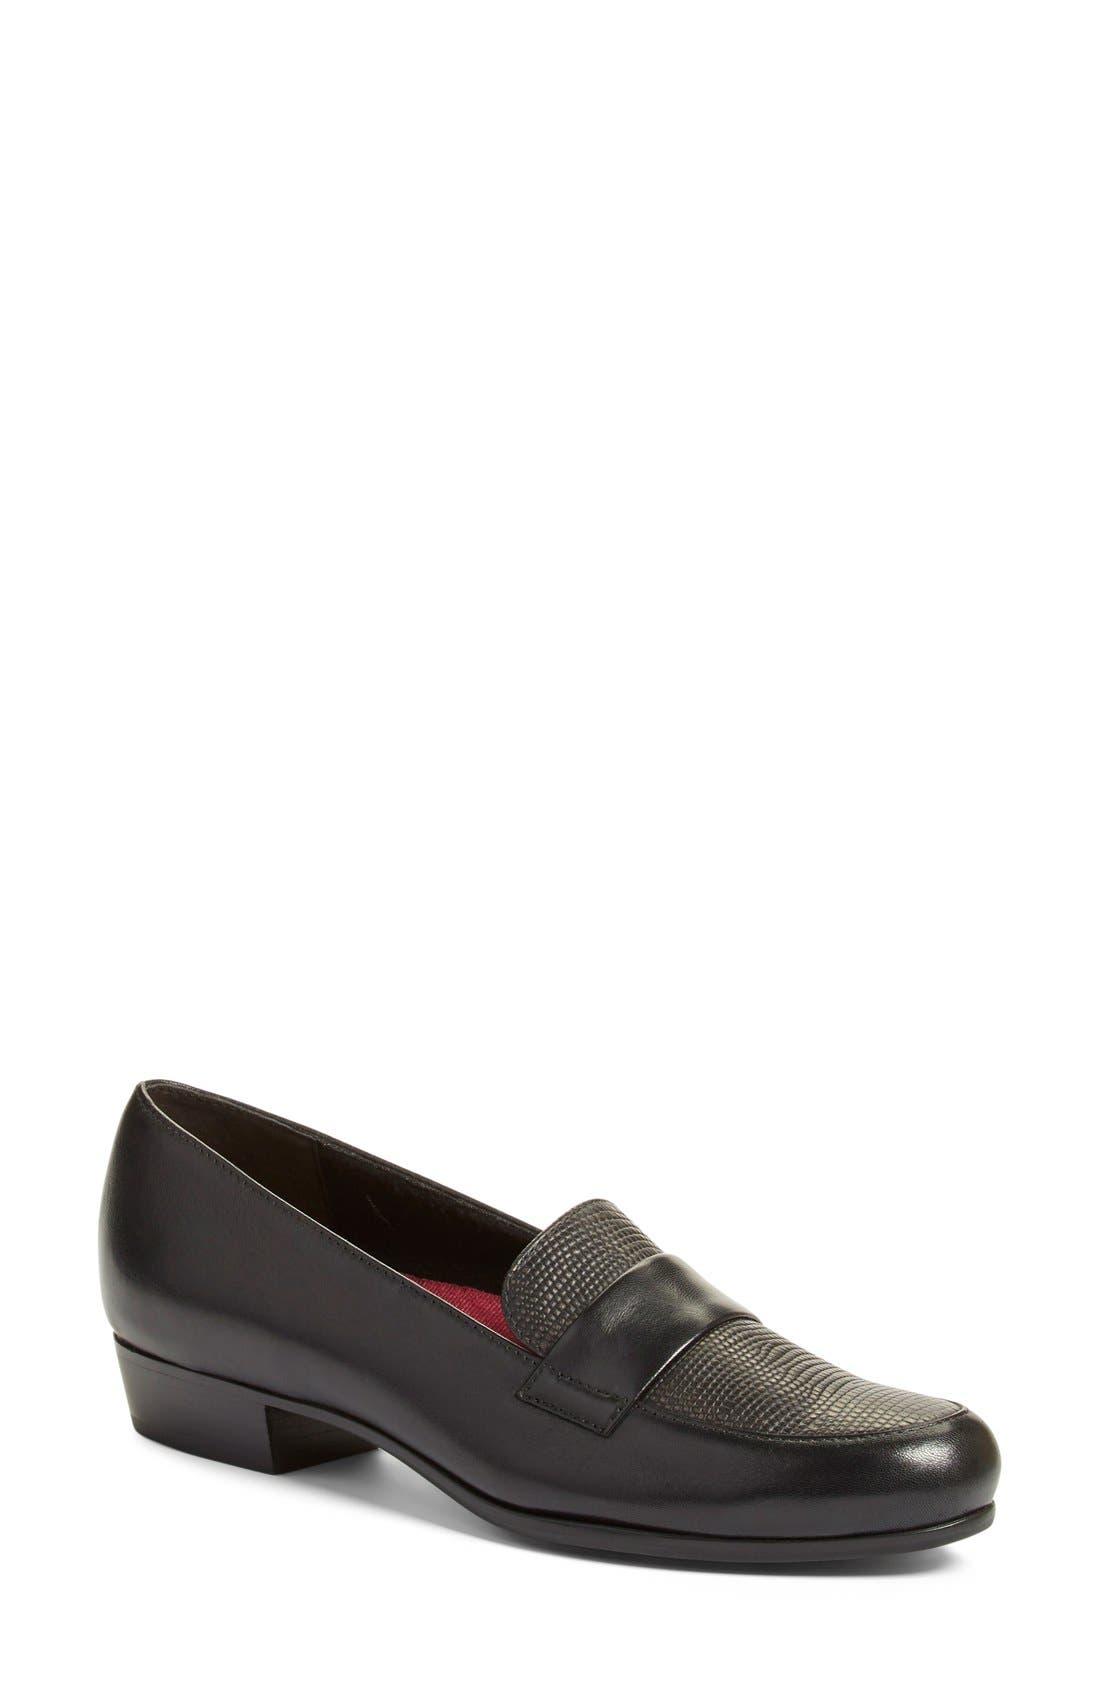 'Kiera' Loafer,                             Main thumbnail 1, color,                             Black Lizard Print Leather